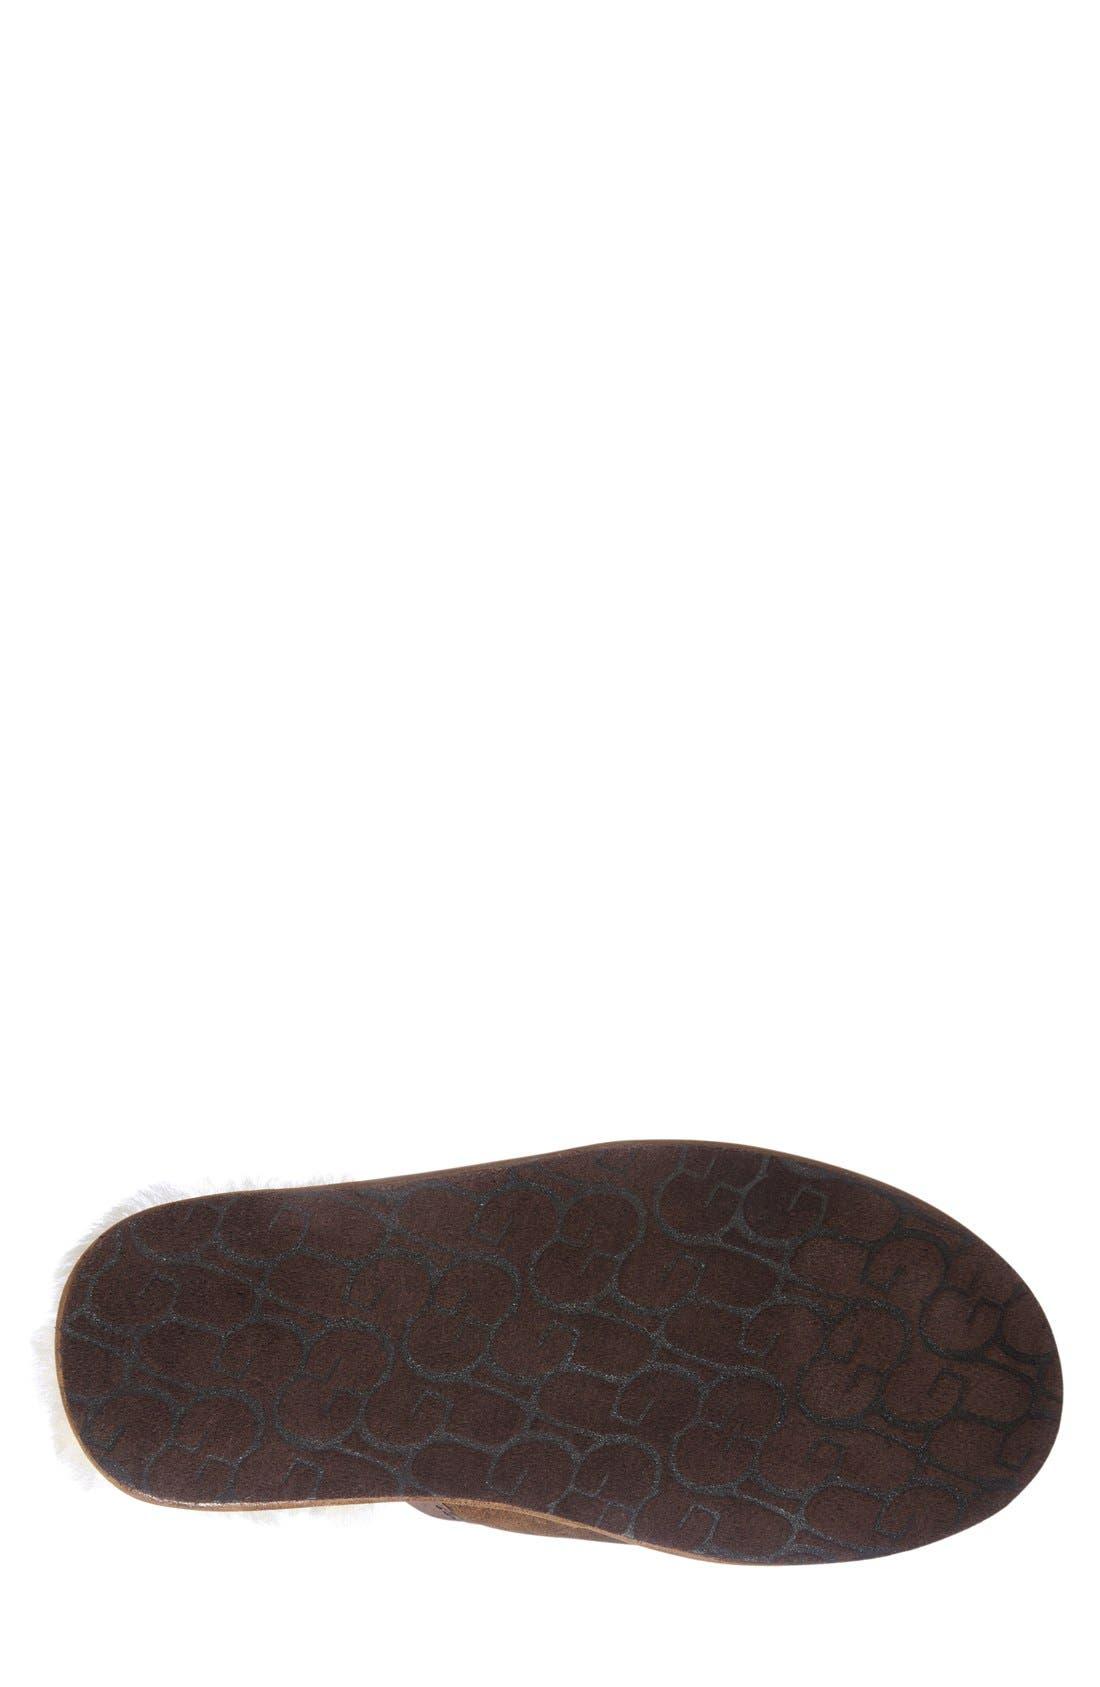 Alternate Image 4  - UGG® Scuff - Deco Genuine Shearling Slipper (Men)